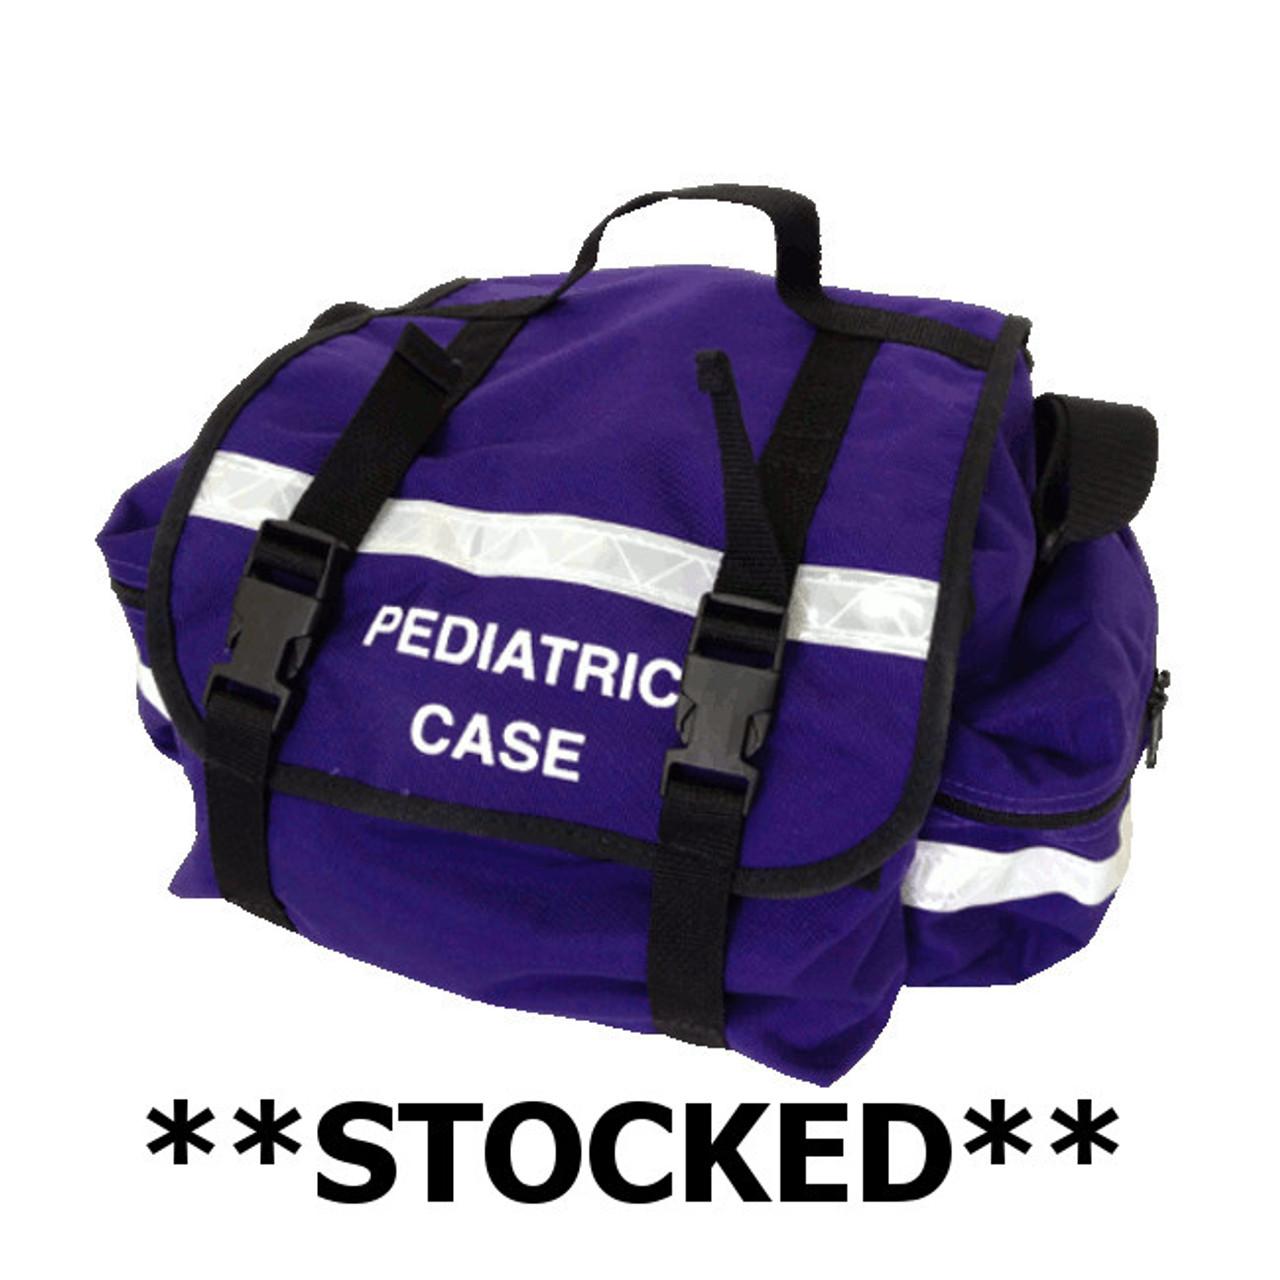 Stocked - Purple Pediatric Equipment Bag